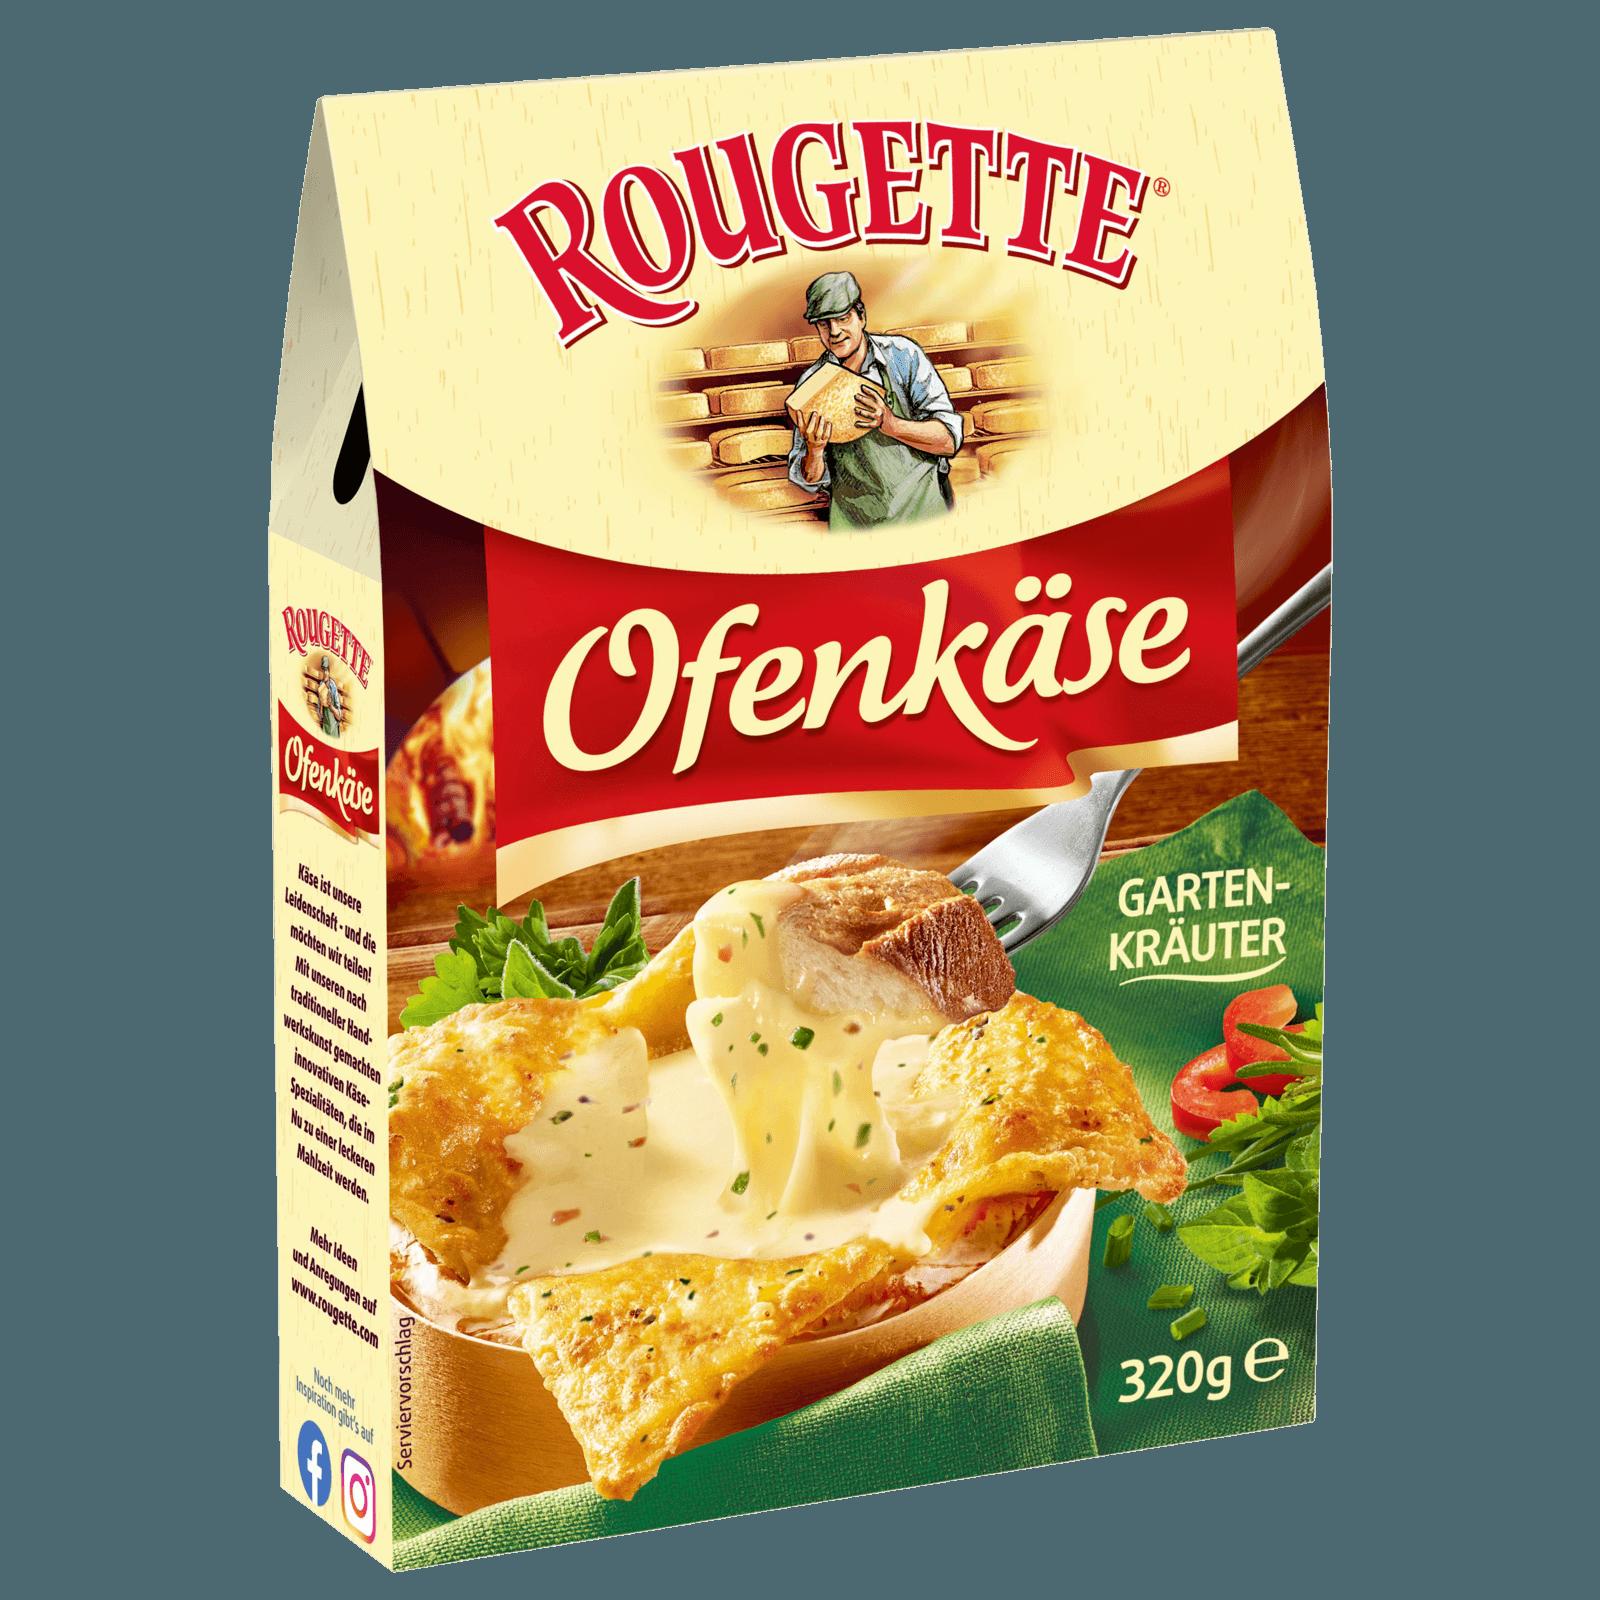 Rougette Ofenkäse Gartenkräuter 320g